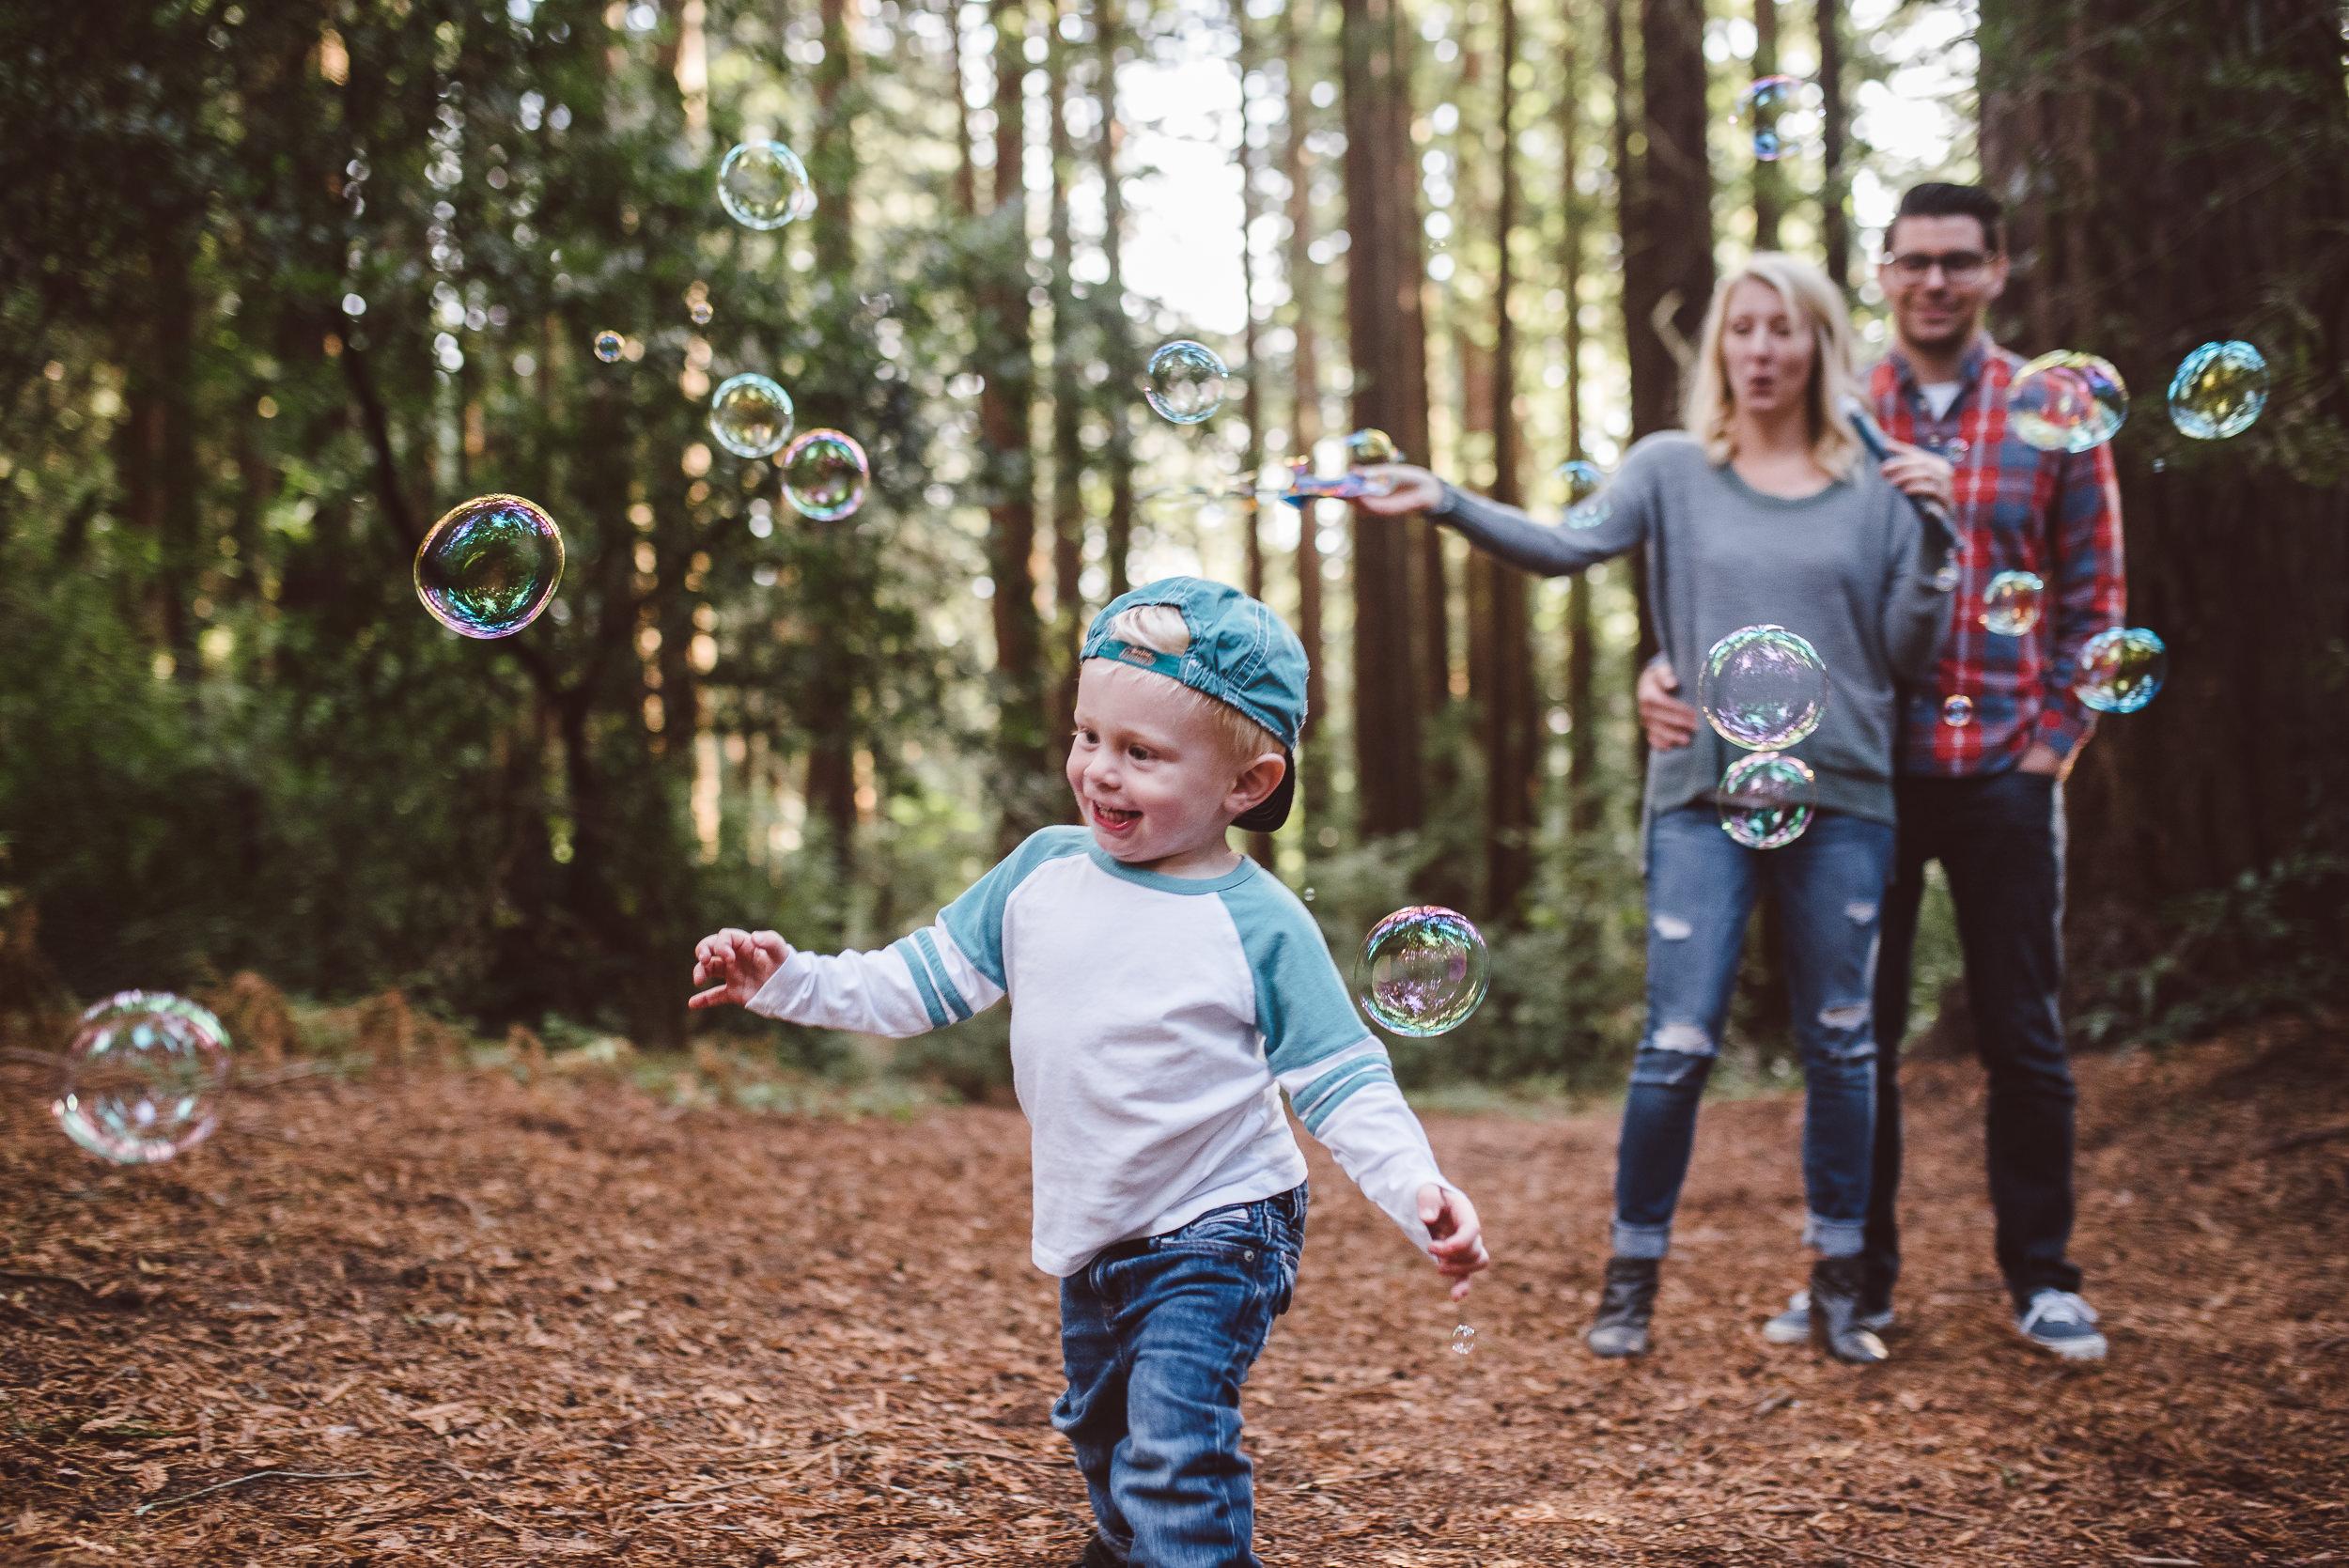 Joaquin-Miller-Park-Oakland-Family-Photography-018.jpg